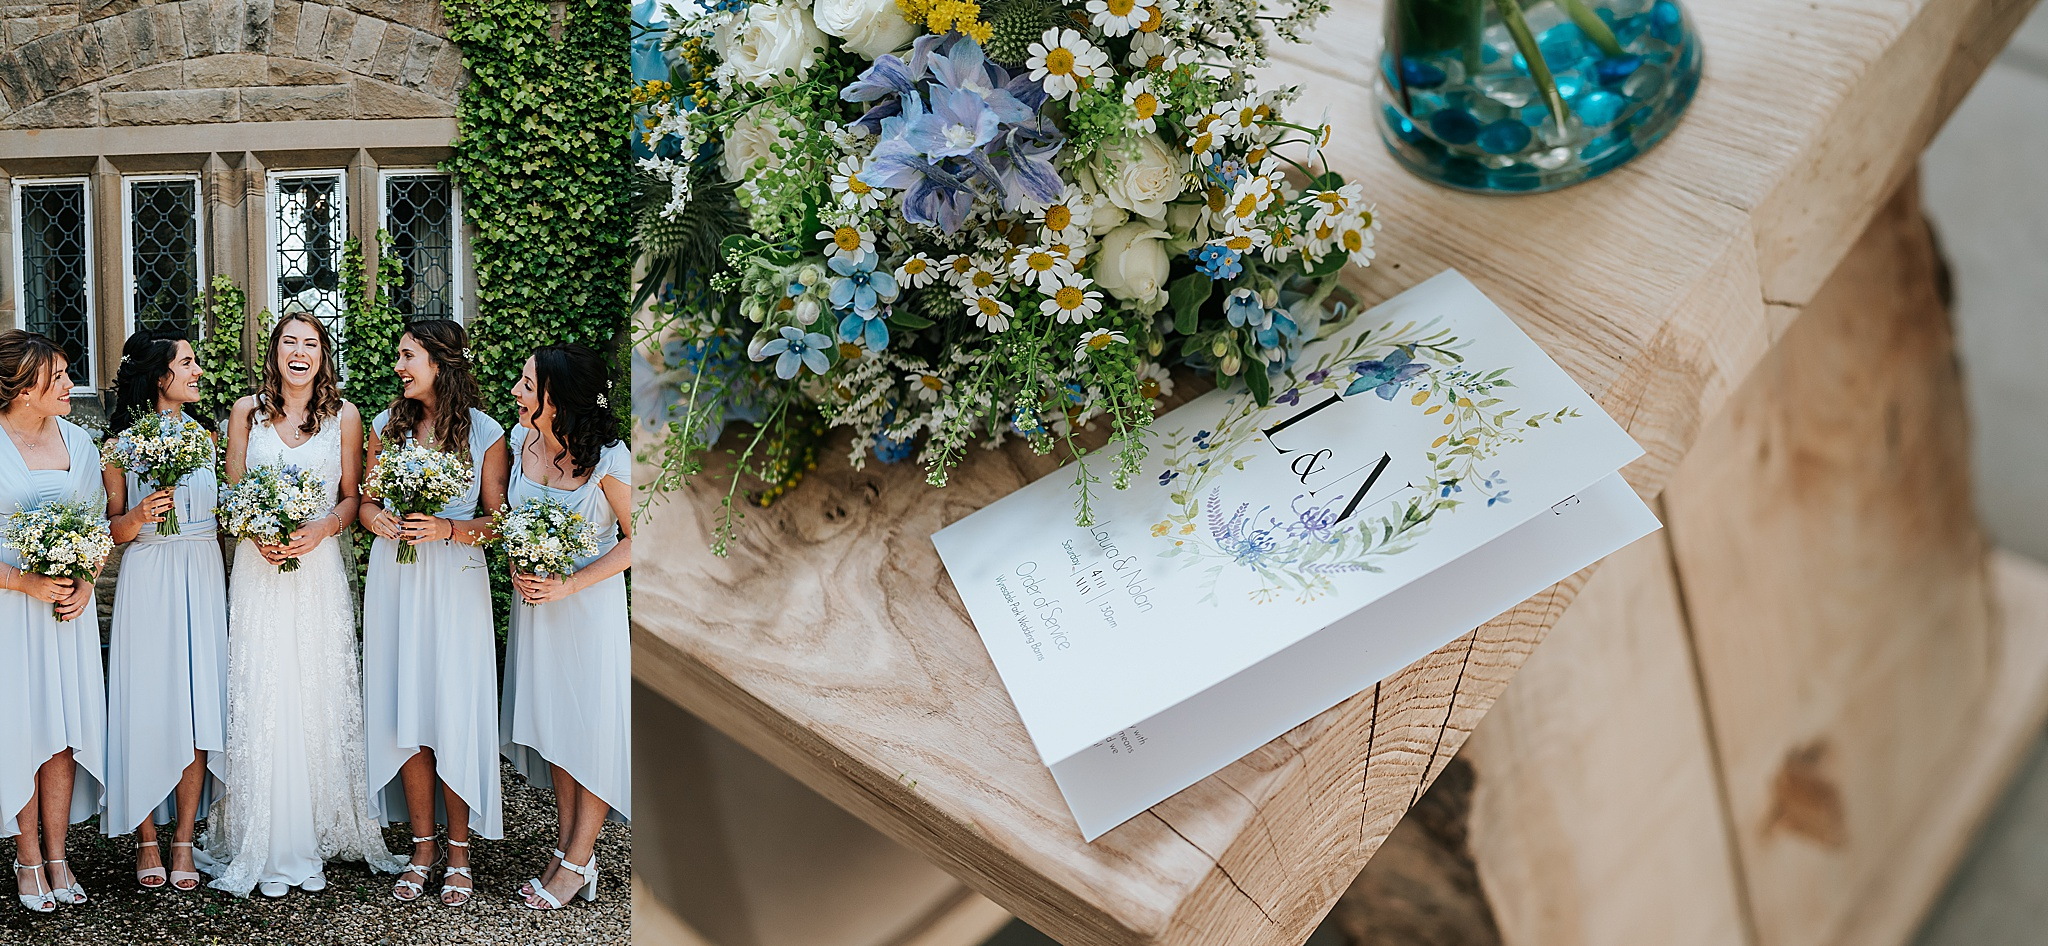 spring wedding at wyresdale park